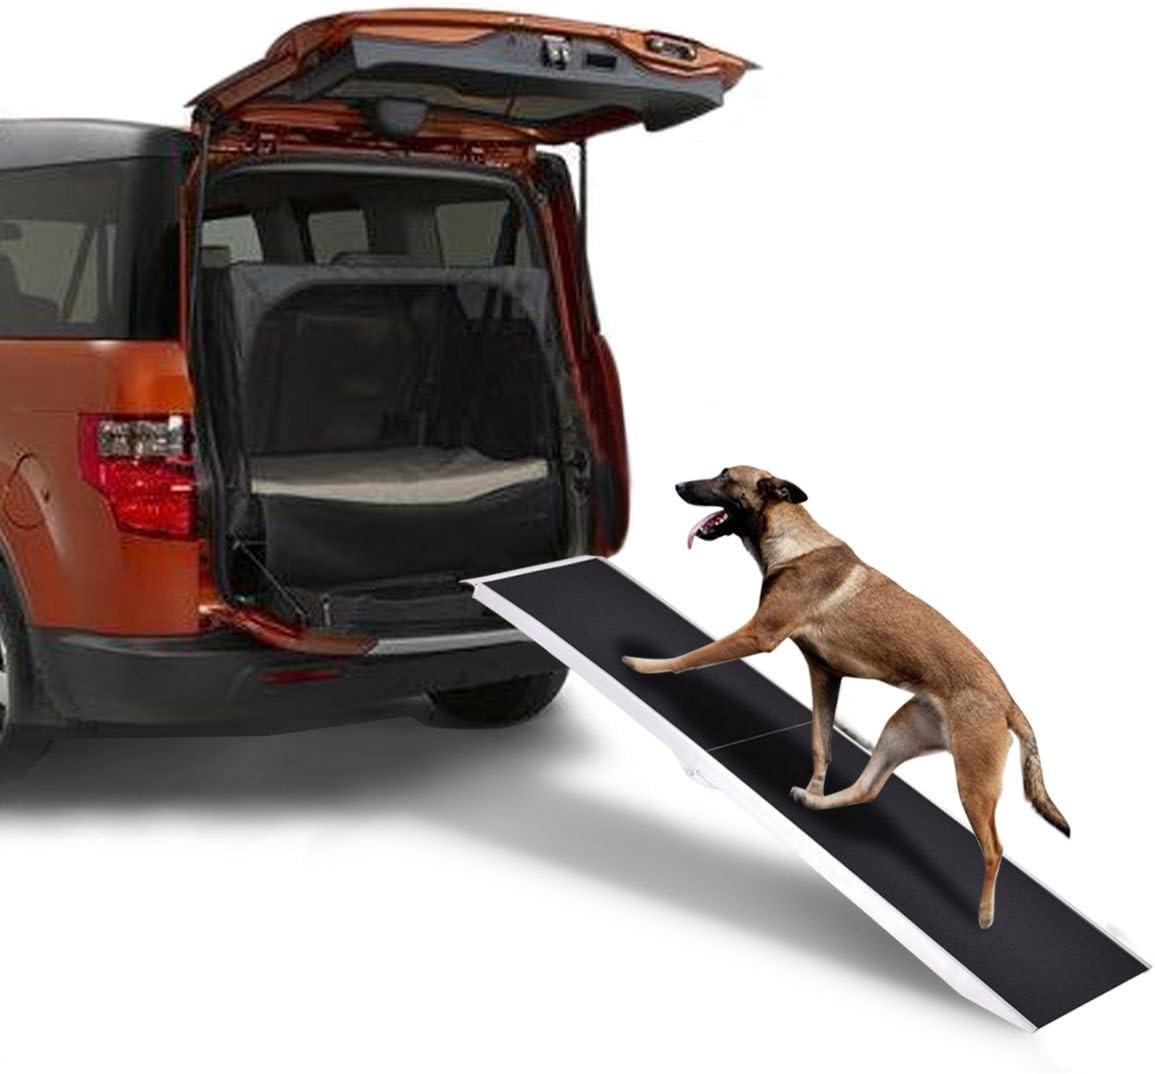 Goplus Pet Ramp Portable Aluminum Folding Paw Safe Dog Ladder Incline Car Truck SUV, 250lbs Capacity